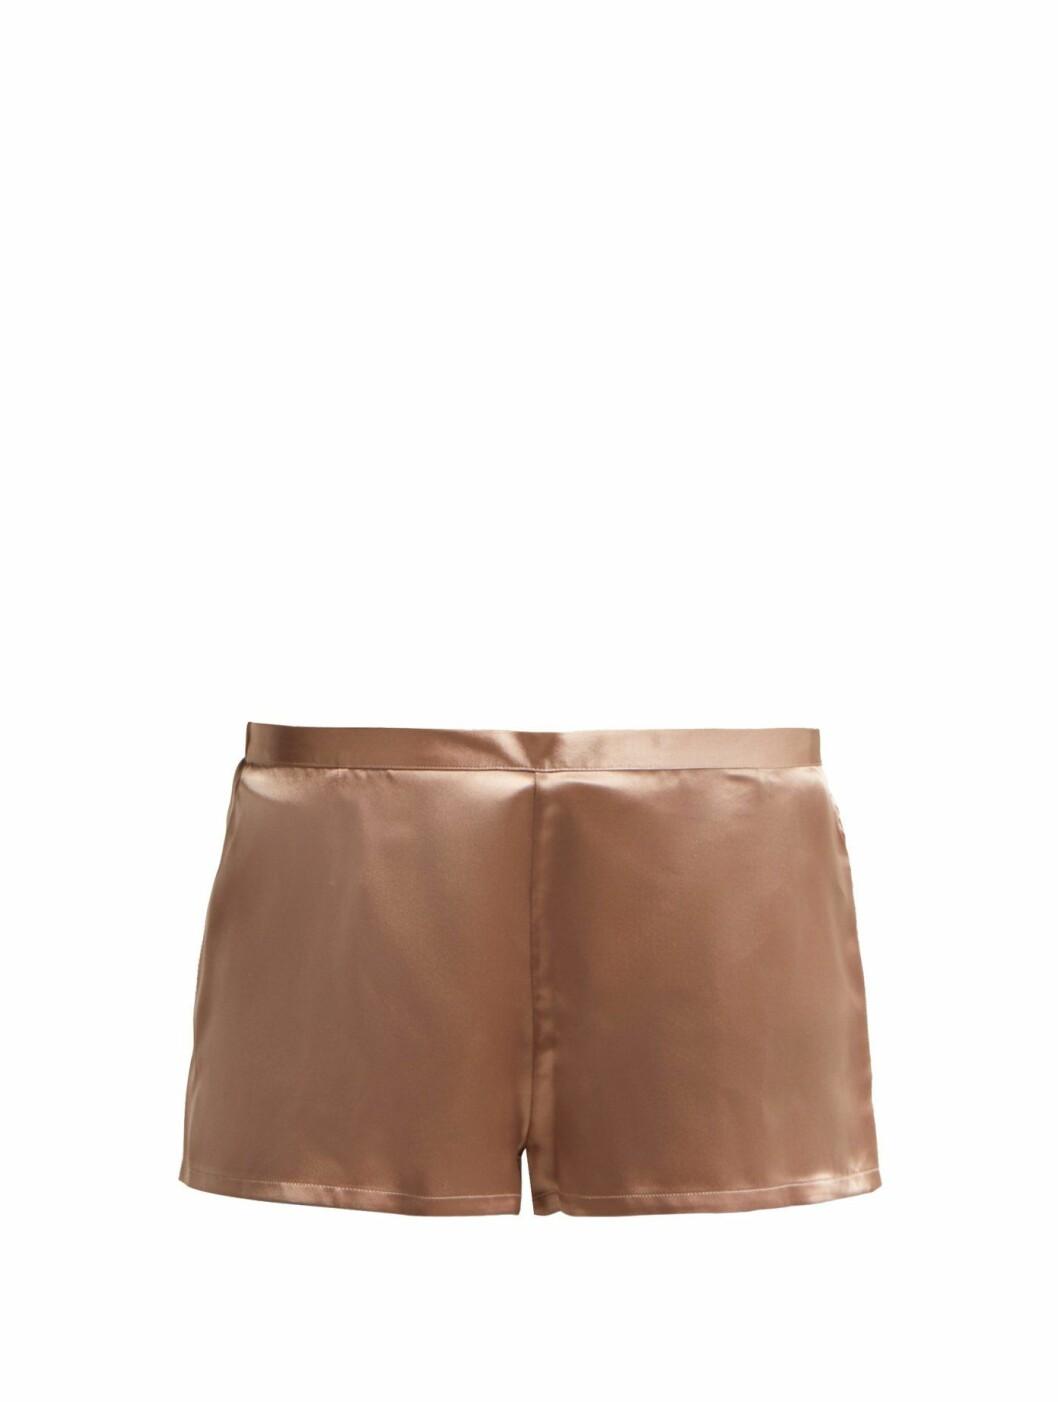 Shorts fra La Perla |705,-| https://www.matchesfashion.com/intl/products/La-Perla-Silk-satin-pyjama-shorts-1248407